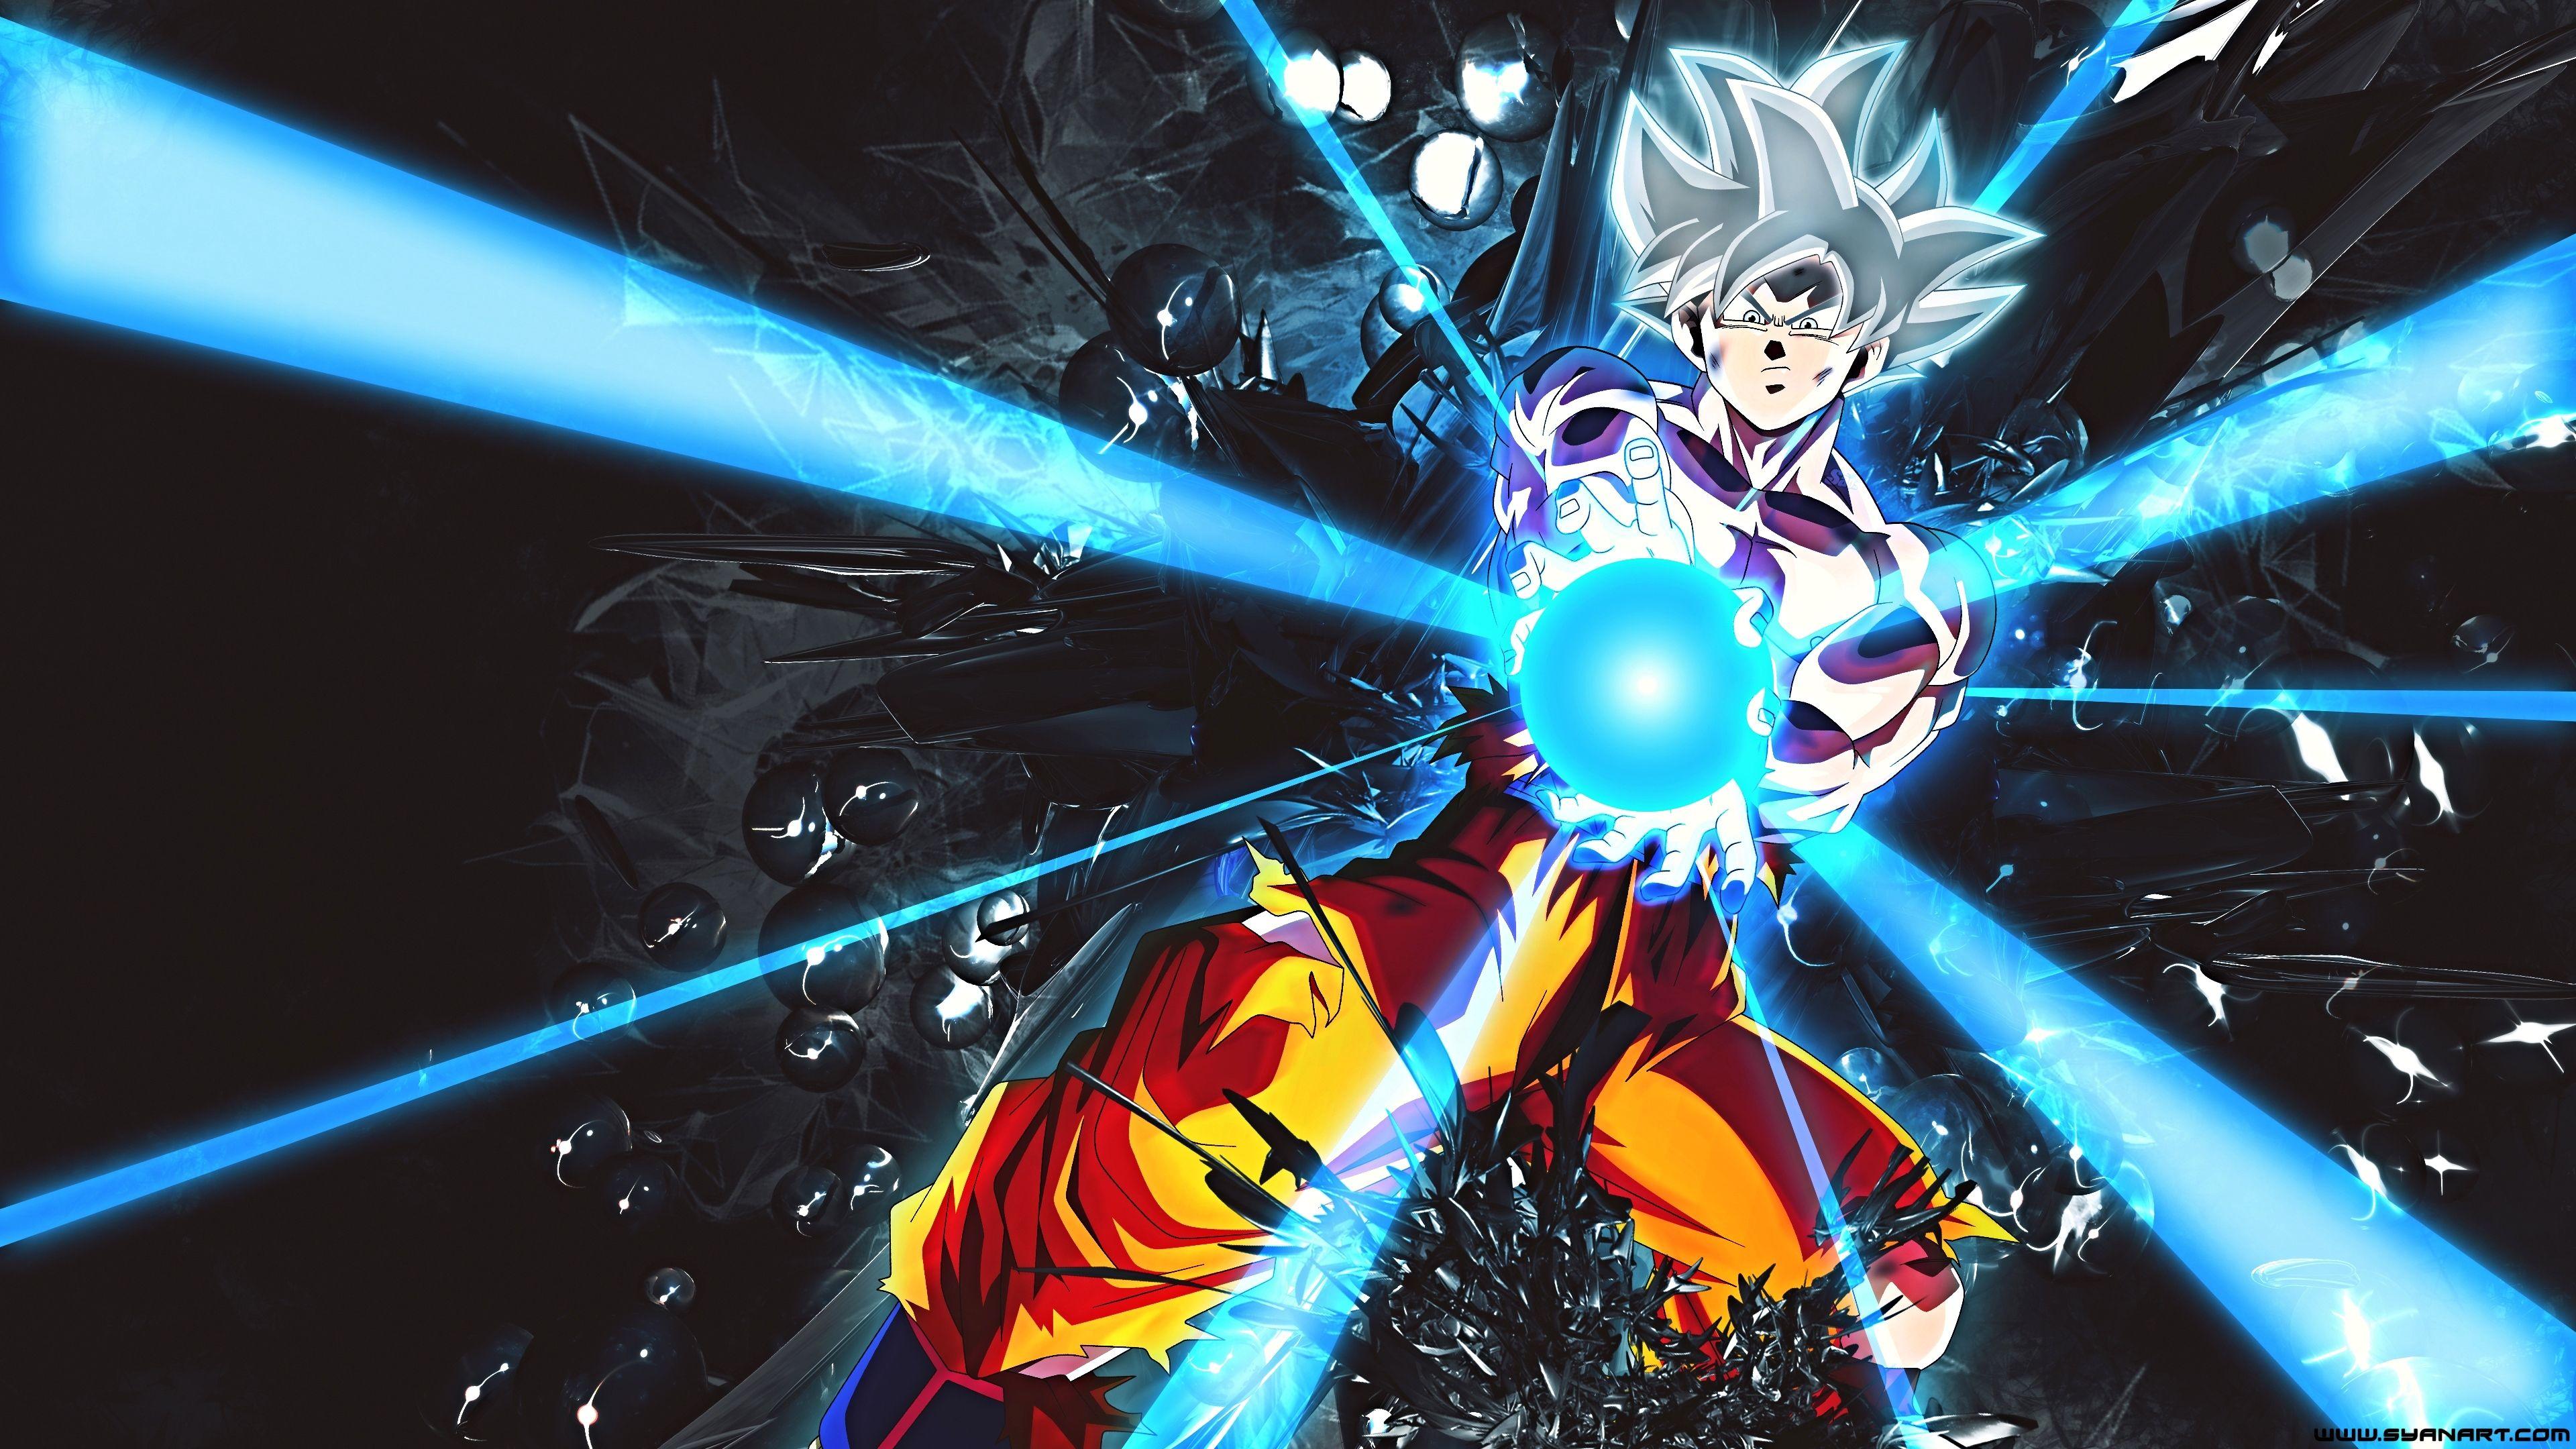 Ultra Instinct Goku Wallpapers Full Hd Dragon Ball Wallpapers Anime Dragon Ball Dragon Ball